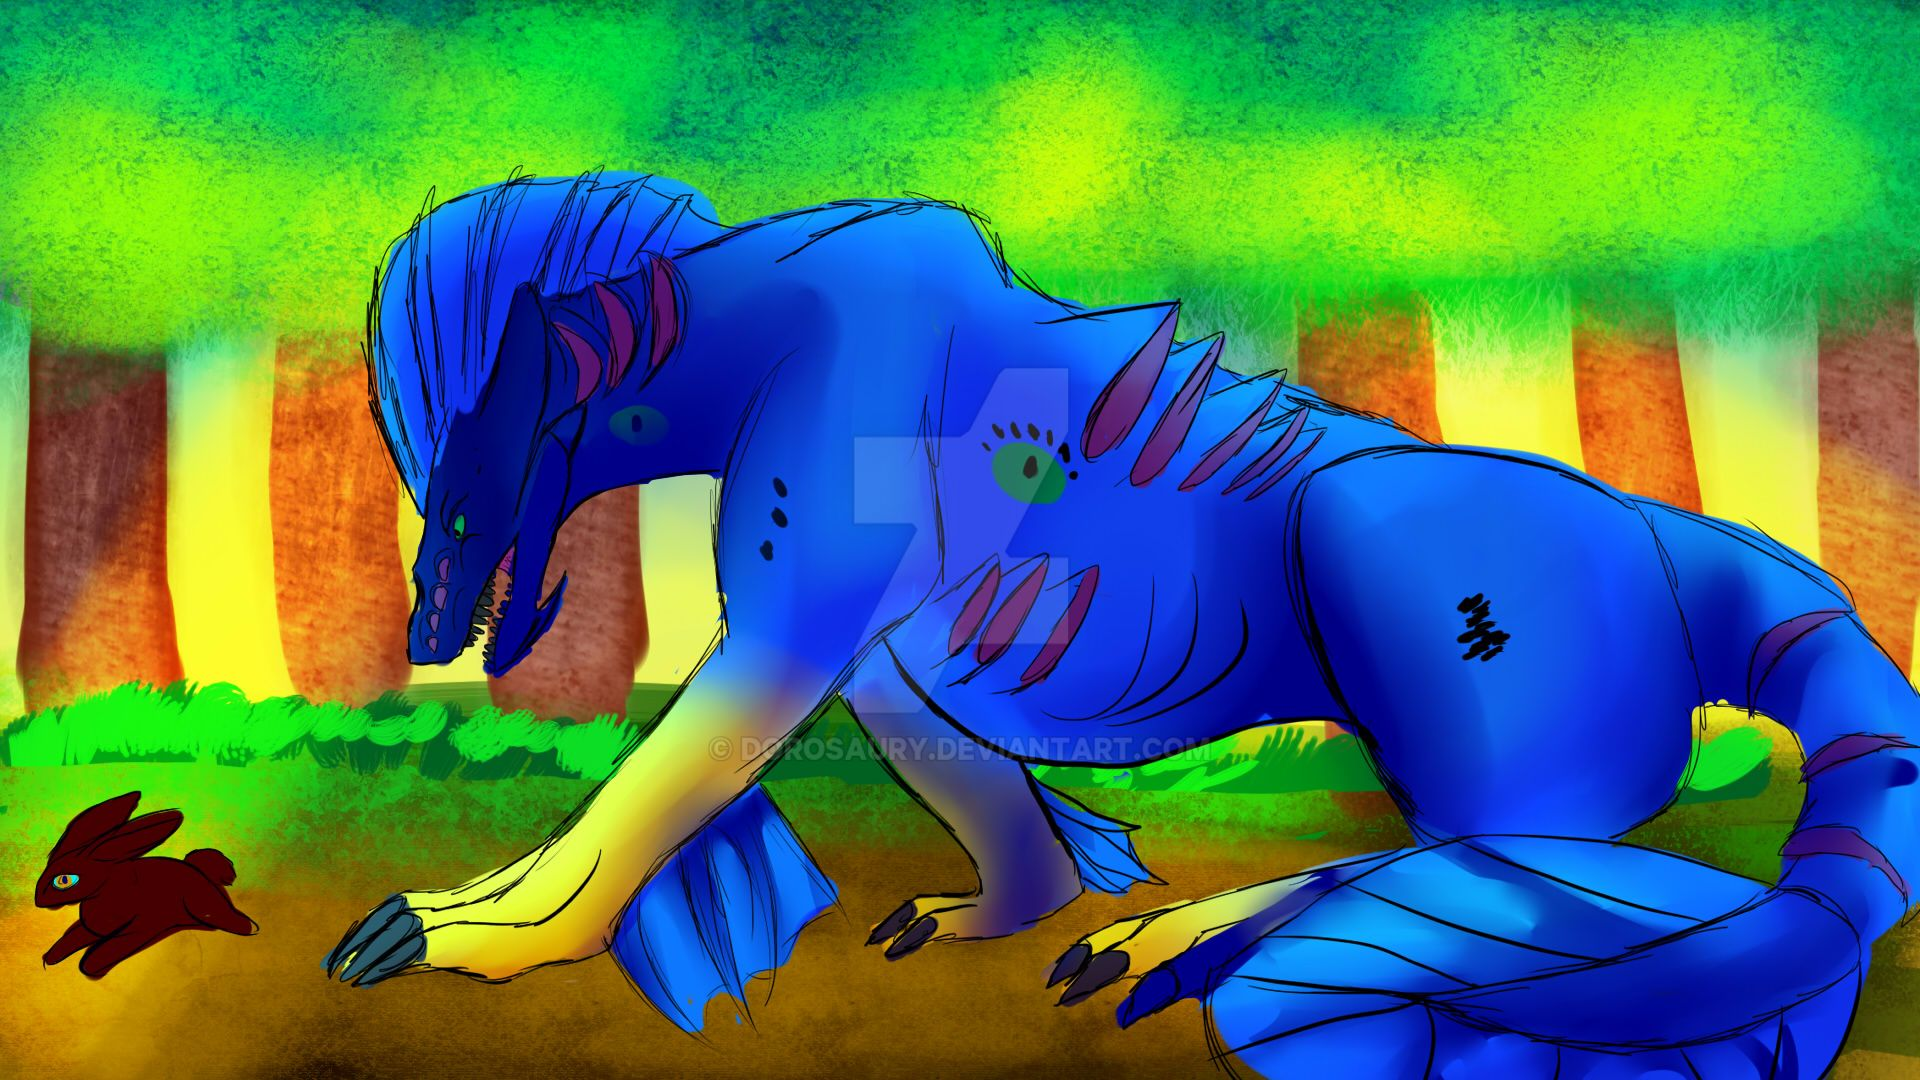 Hunting by Dorosaury